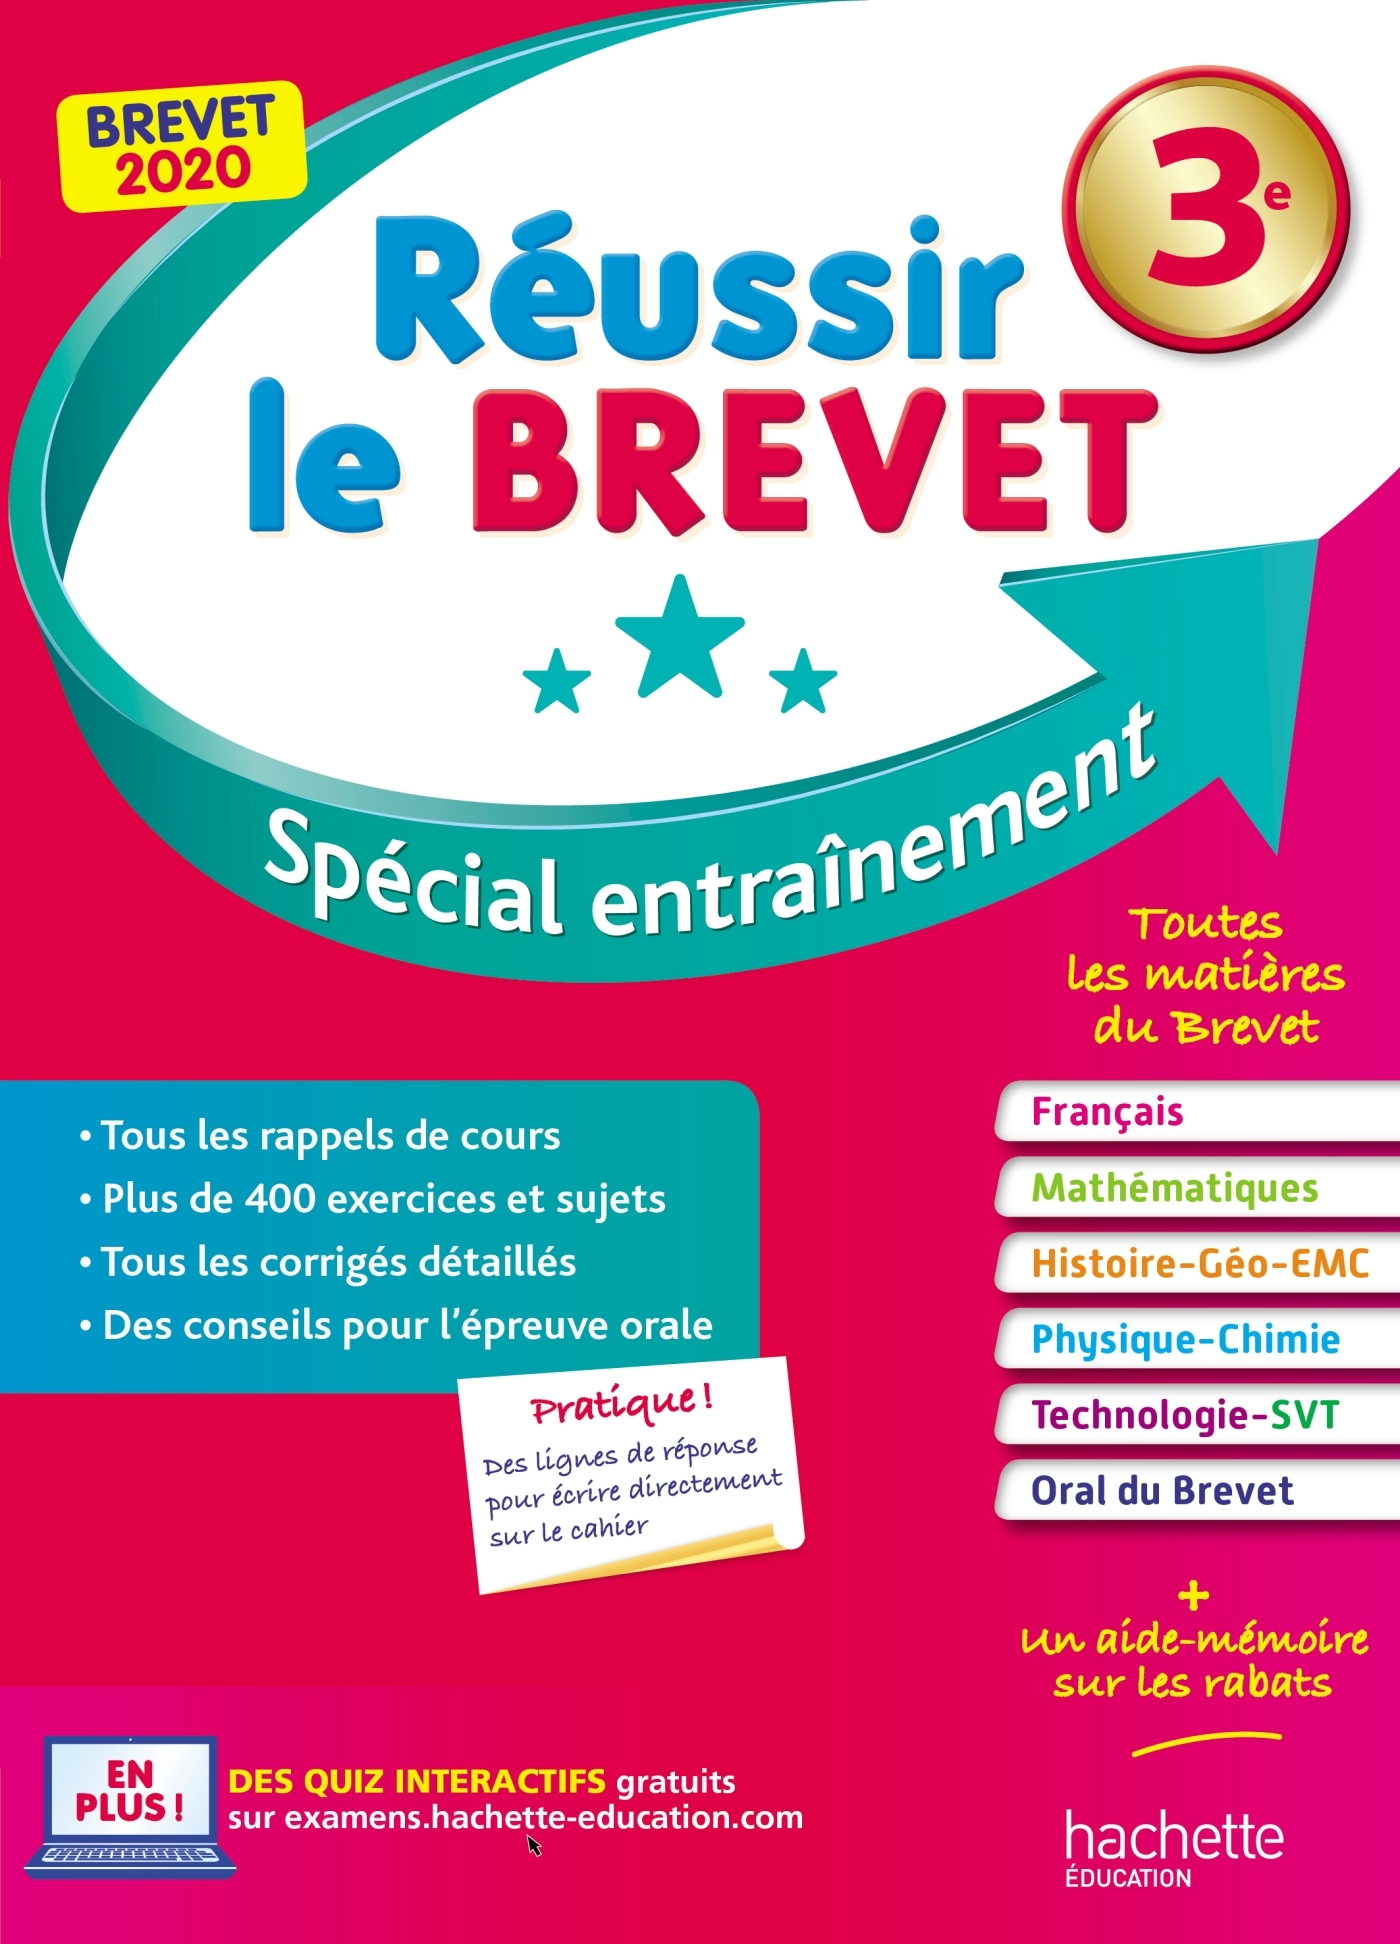 REUSSIR LE BREVET : NOUVEAU BREVET 3E 2019